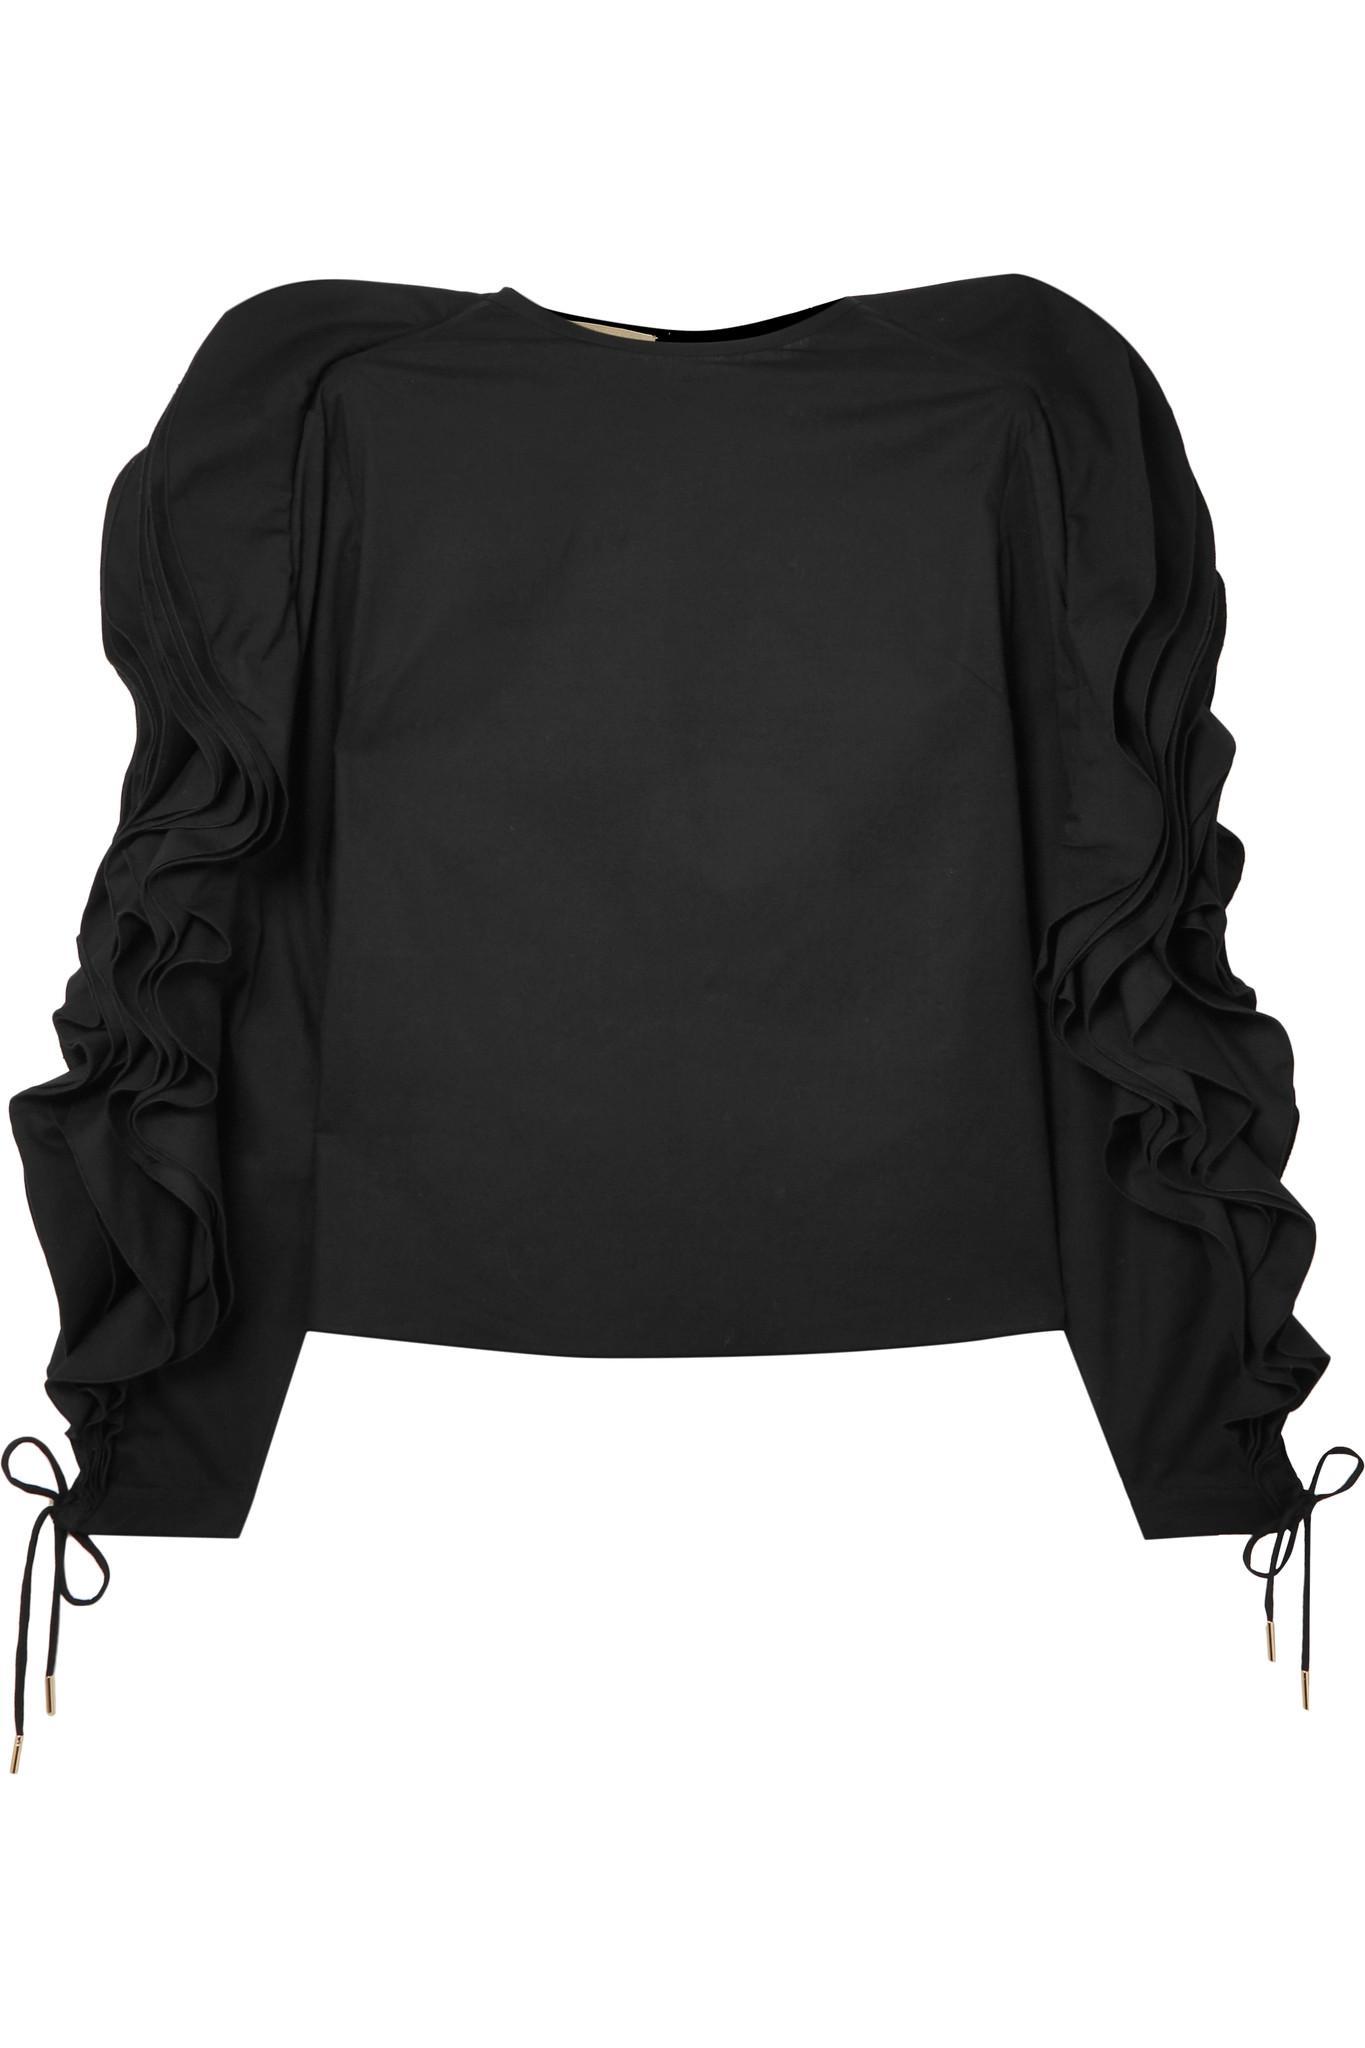 Ruffled Lace-up Cotton-blend Poplin Blouse - Black Antonio Berardi Buy Cheap Deals Cheap Sale Big Sale Find Great Cheap Online Buy Cheap Visit Discount Amazing Price UxDzjYL